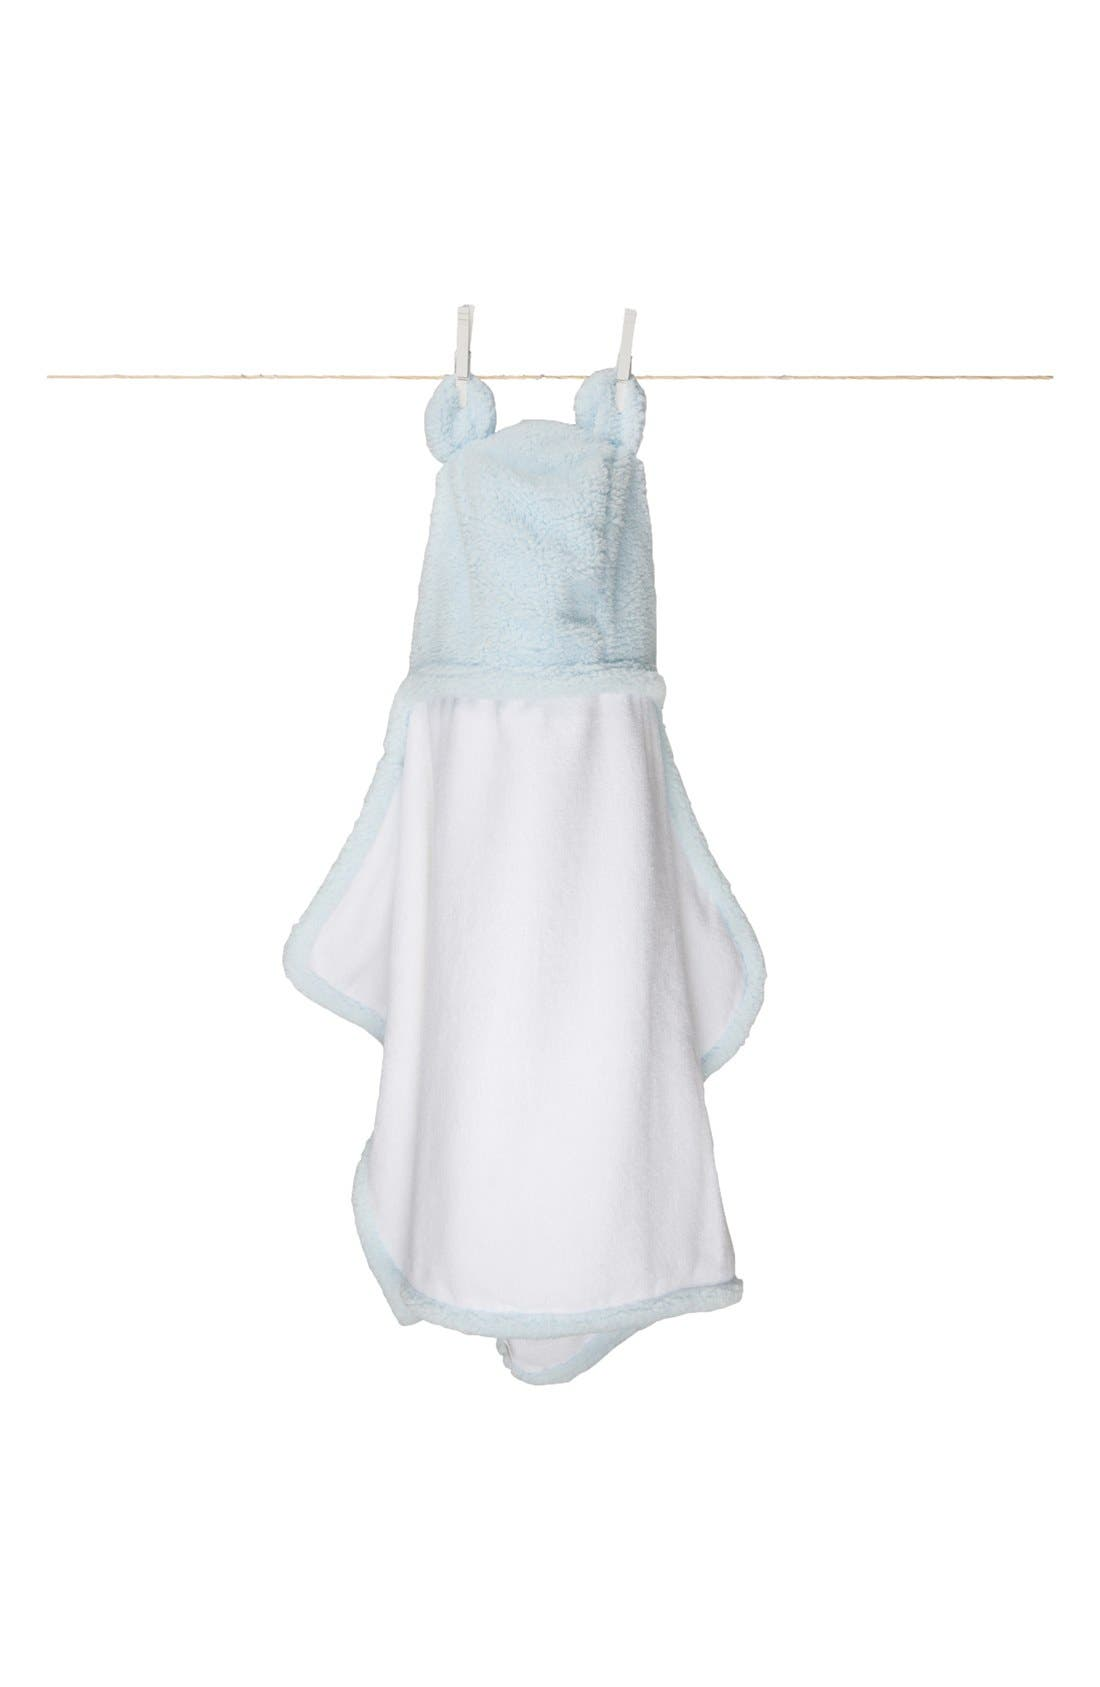 'Bella<sup>™</sup>' Towel,                         Main,                         color, BLUE